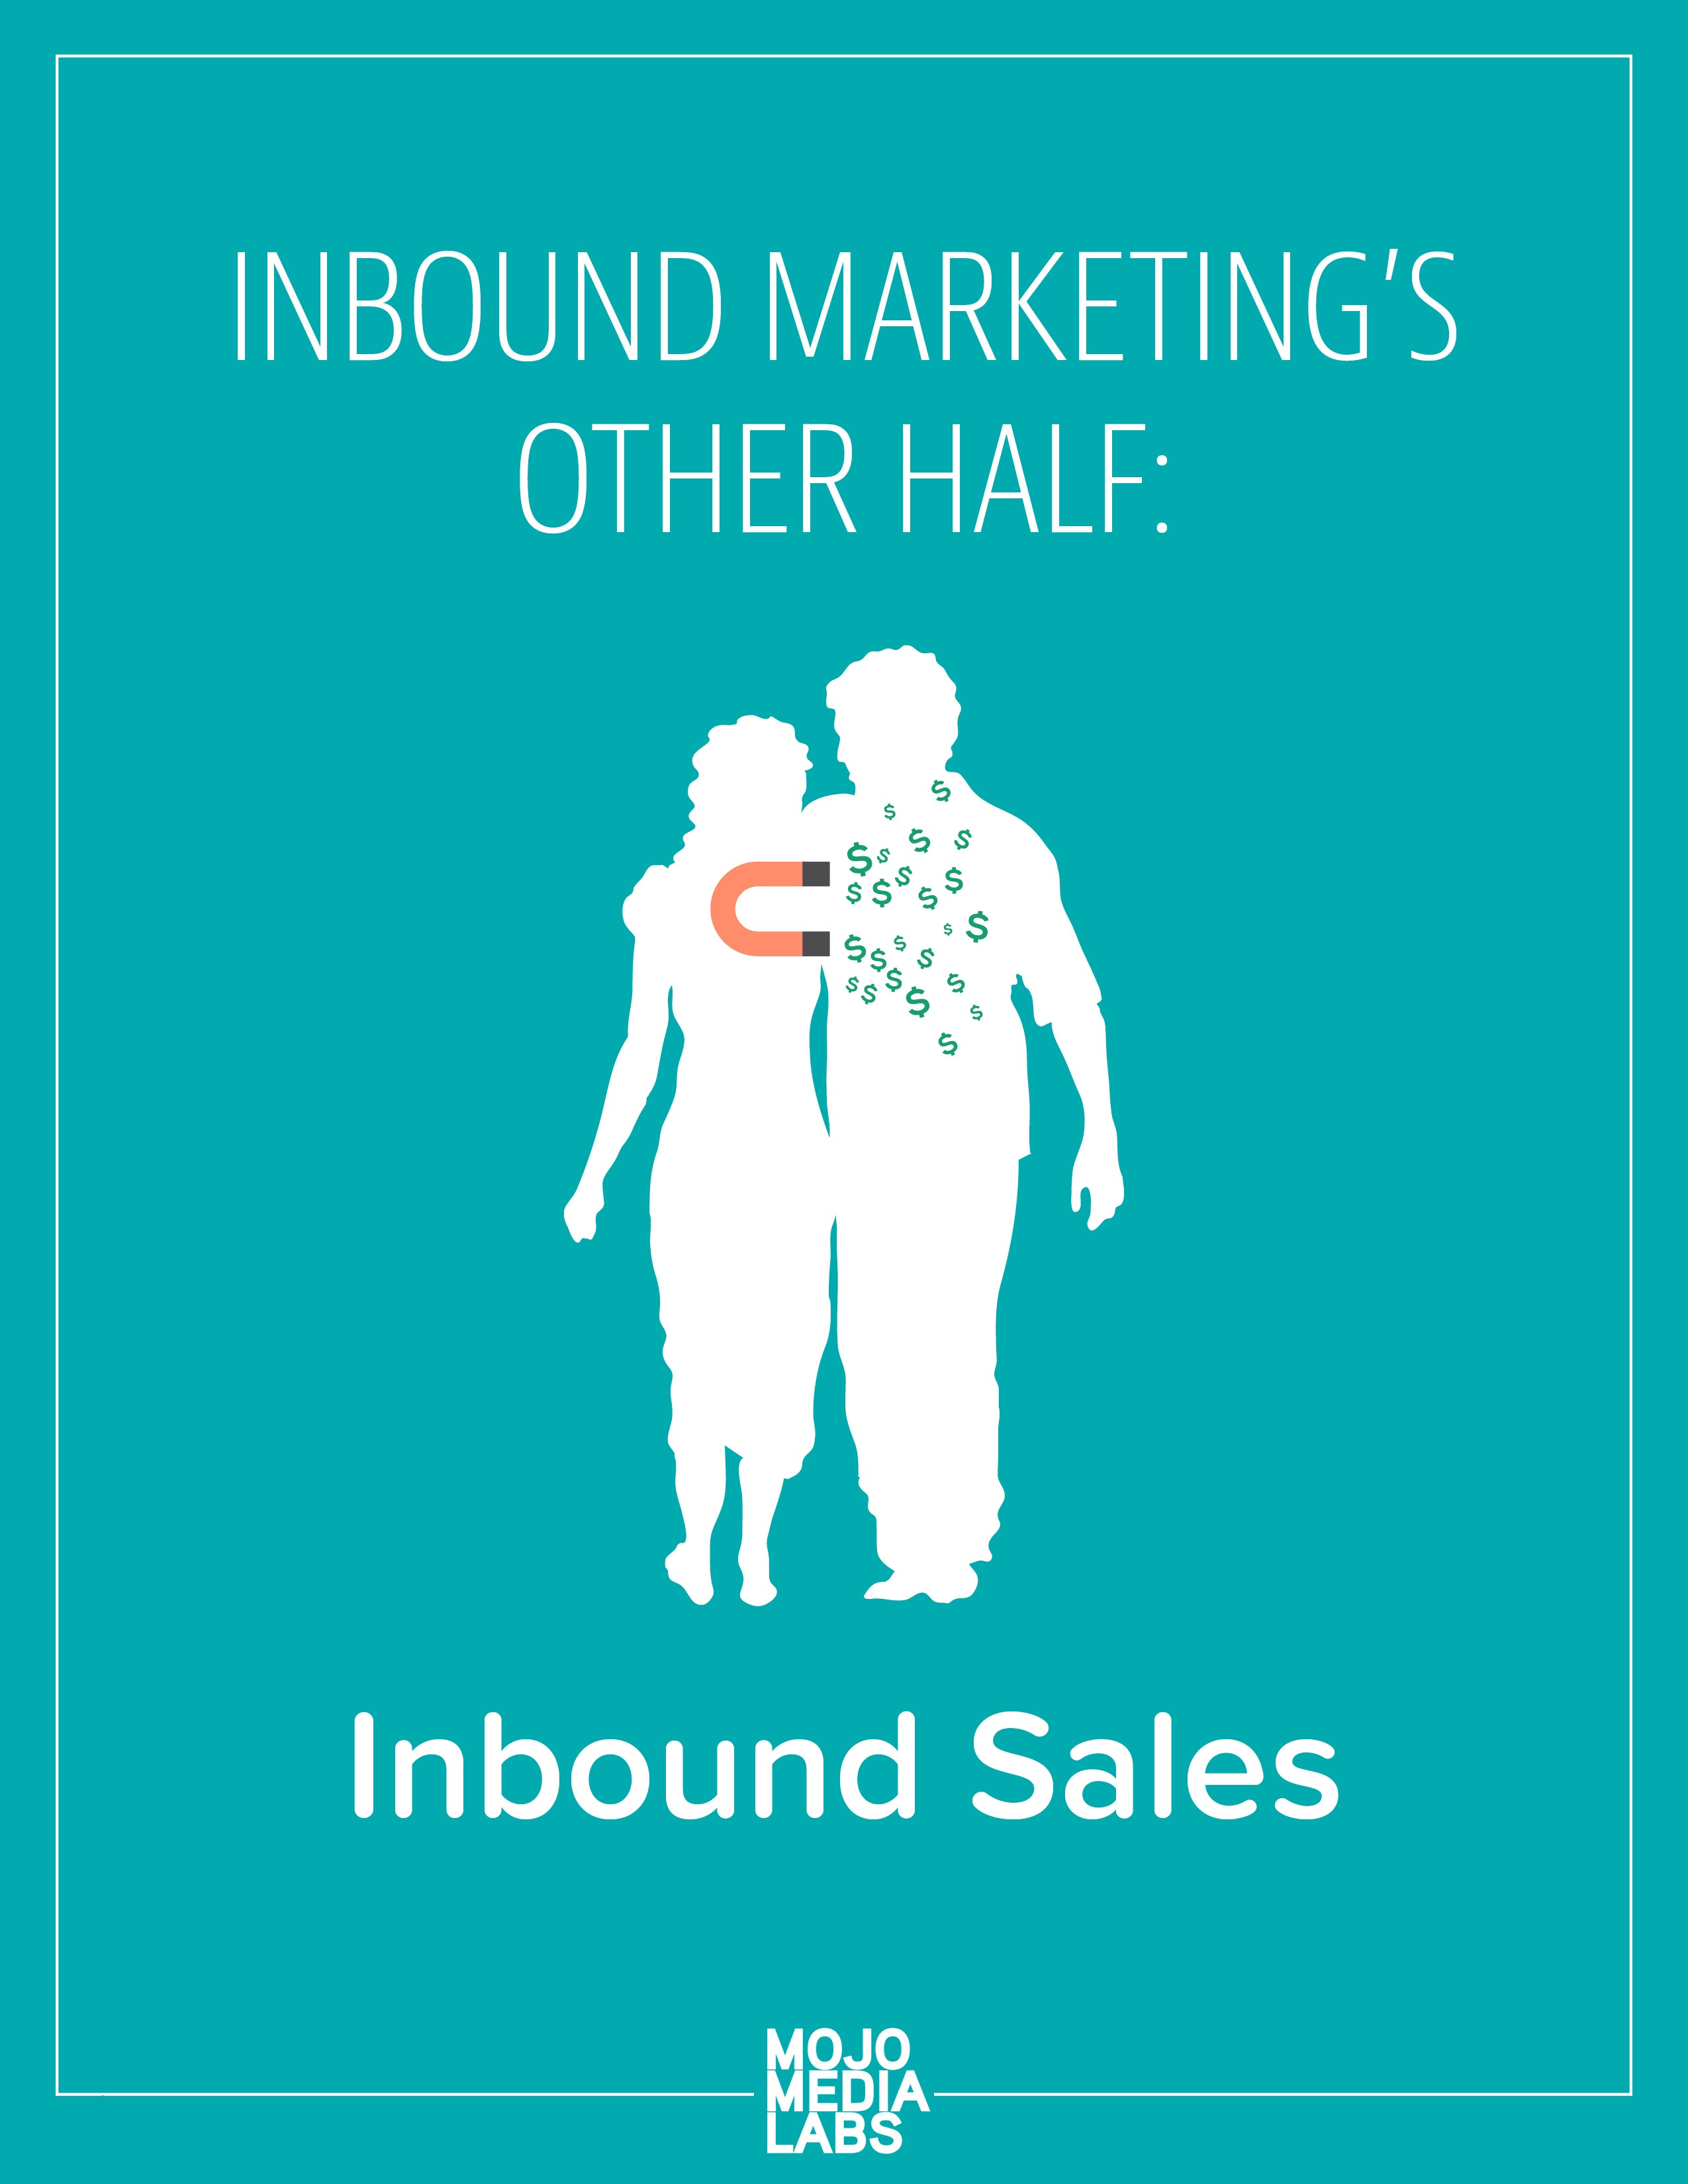 Mojo_TOFU Inbound Sales Offer-cover.jpg